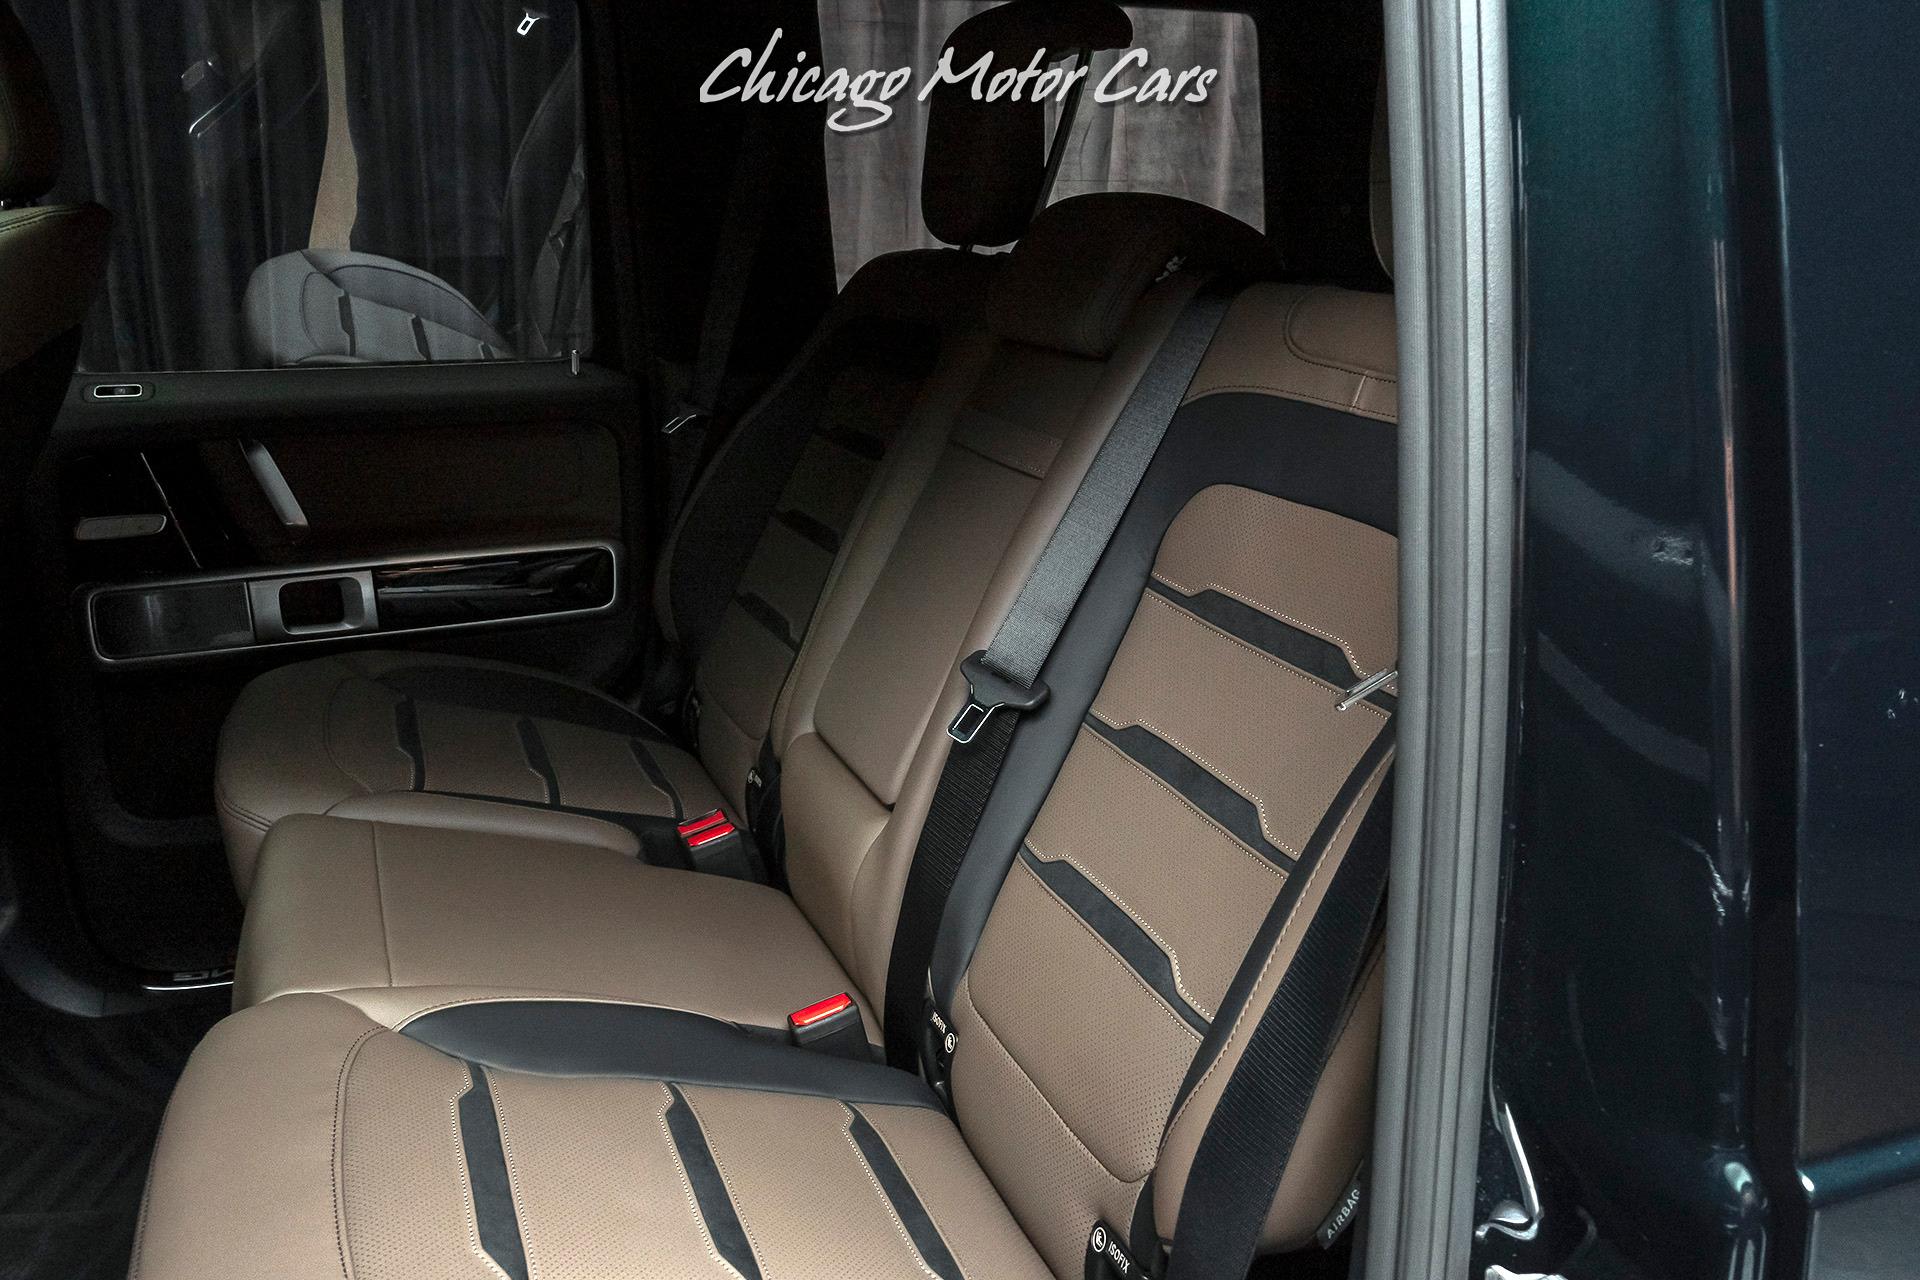 New-2020-Mercedes-Benz-G63-AMG-4-Matic-4-Matic-SUV-RARE-Emerald-Green-Metallic-Beautiful-Color-Combo